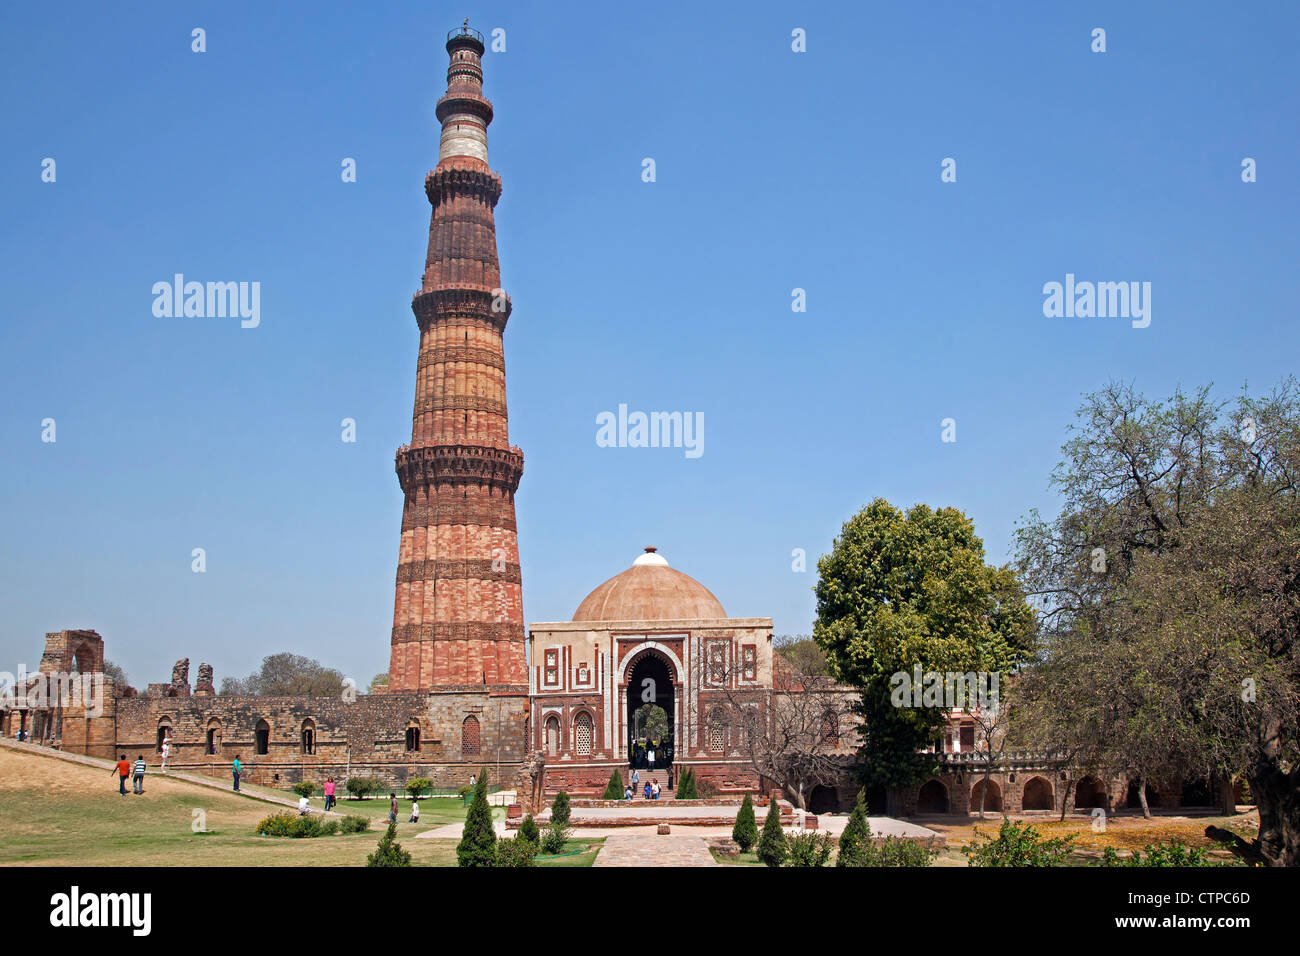 Qutub Minar / Qutb Minar, UNESCO World Heritage Site and tallest minaret in Delhi, India - Stock Image